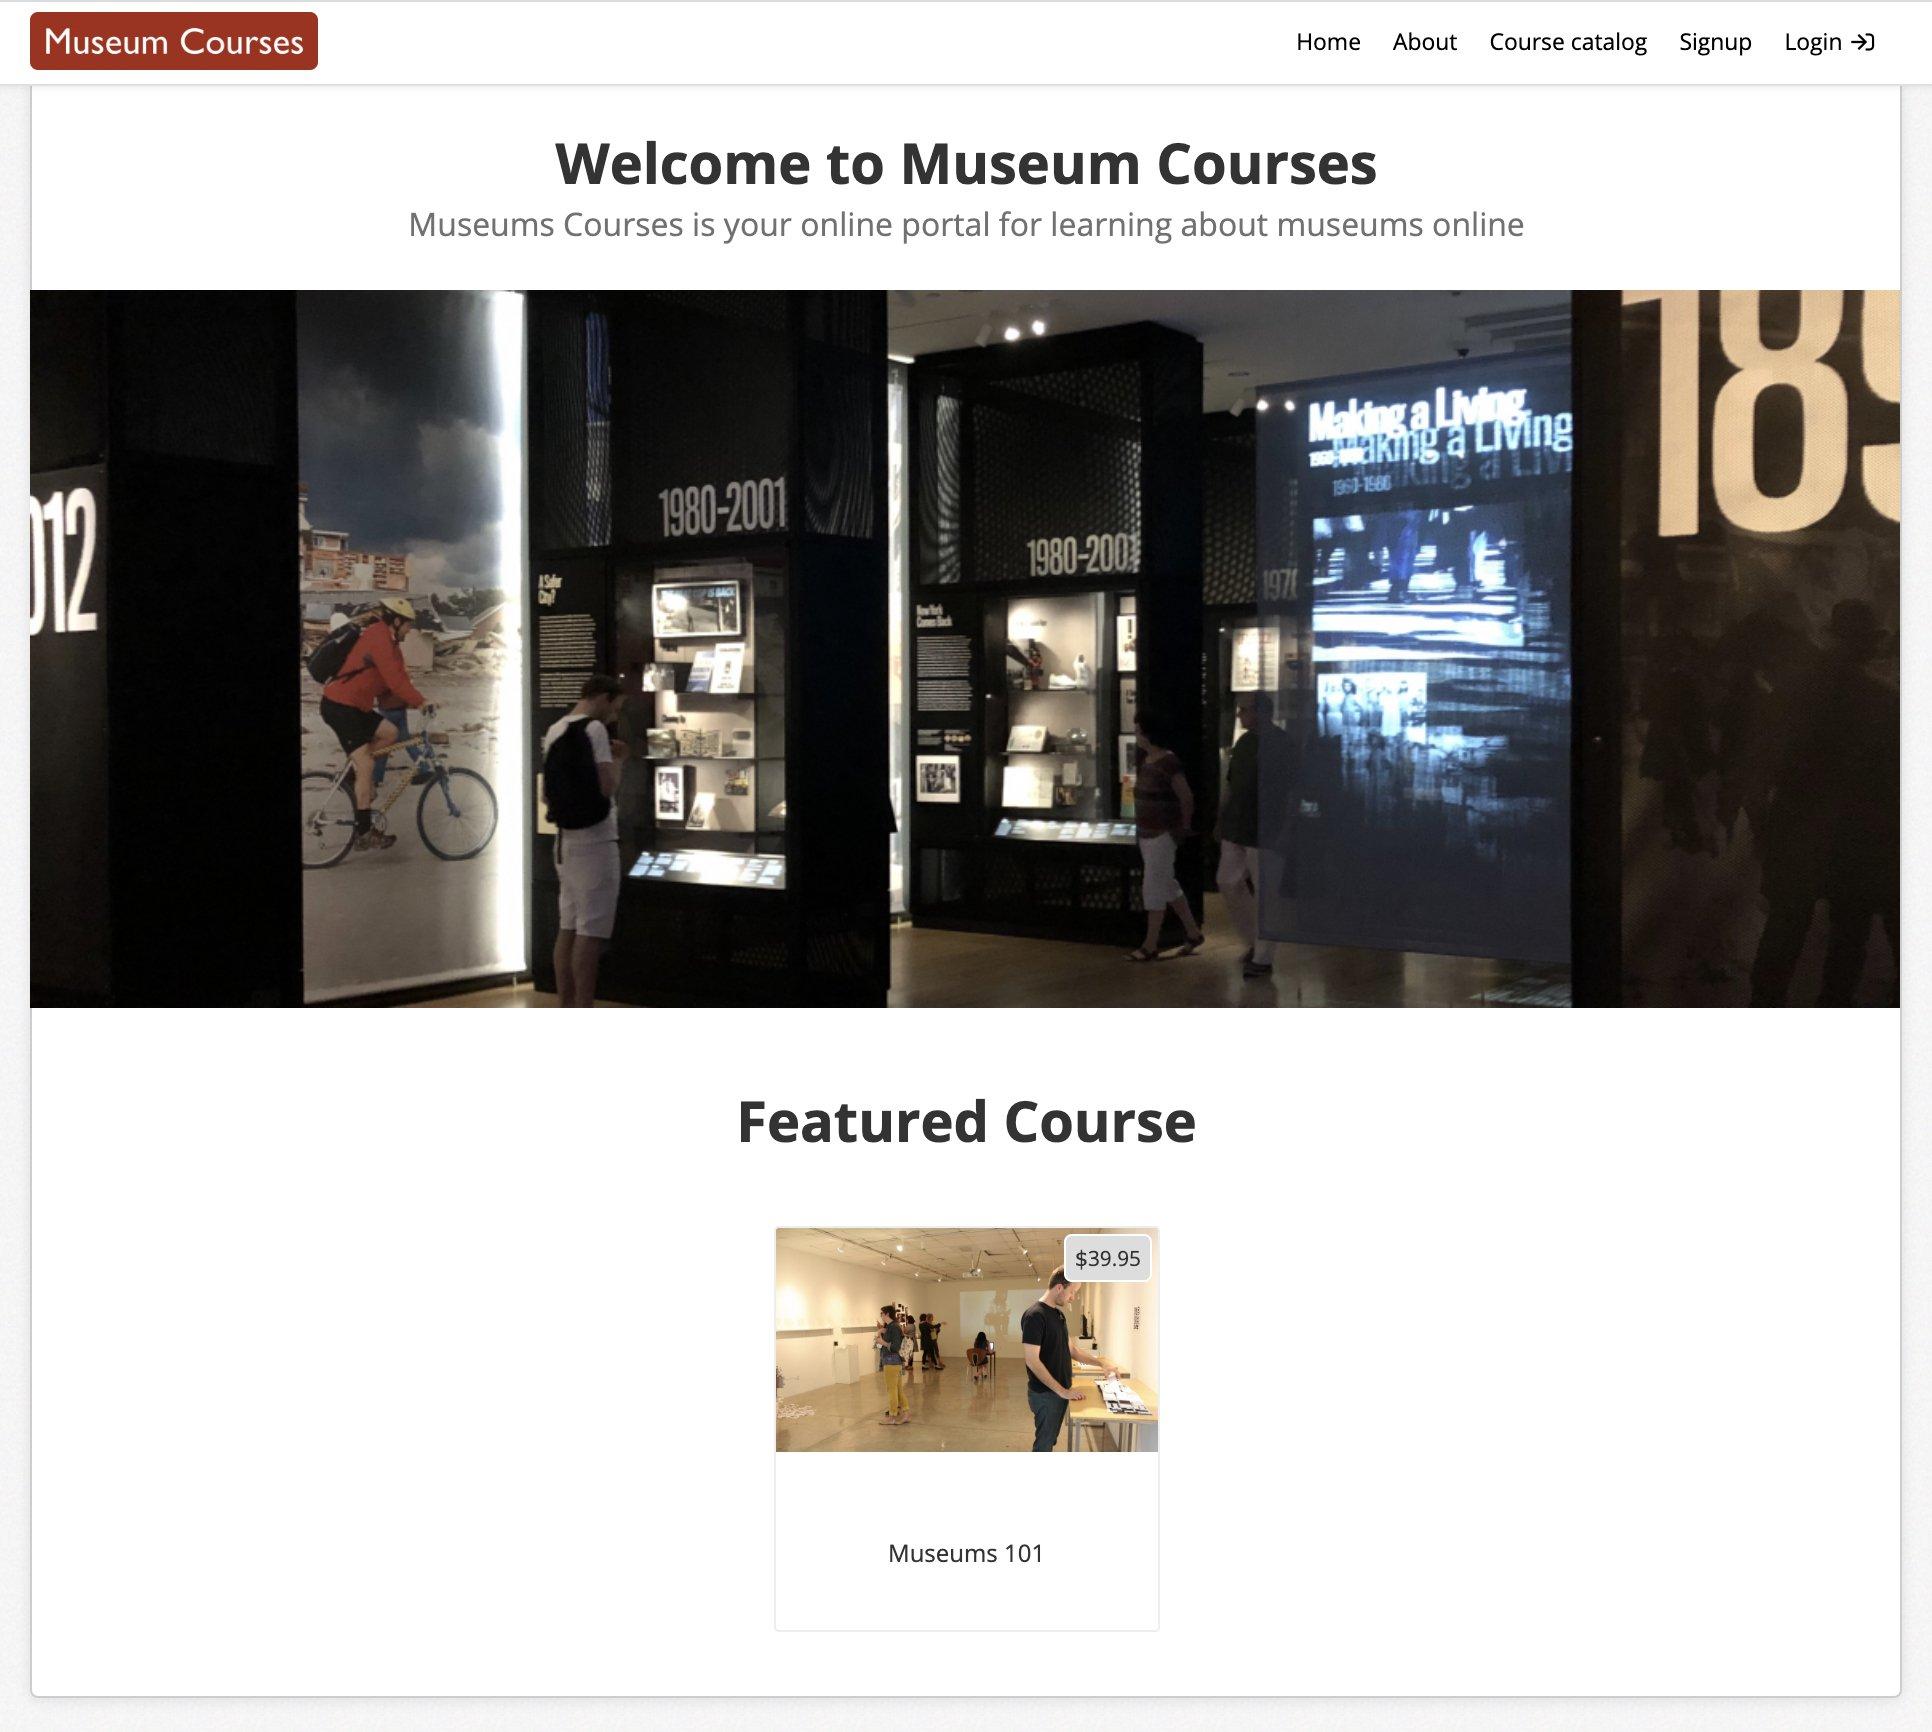 MuseumCourses.com online portal for online museum classes